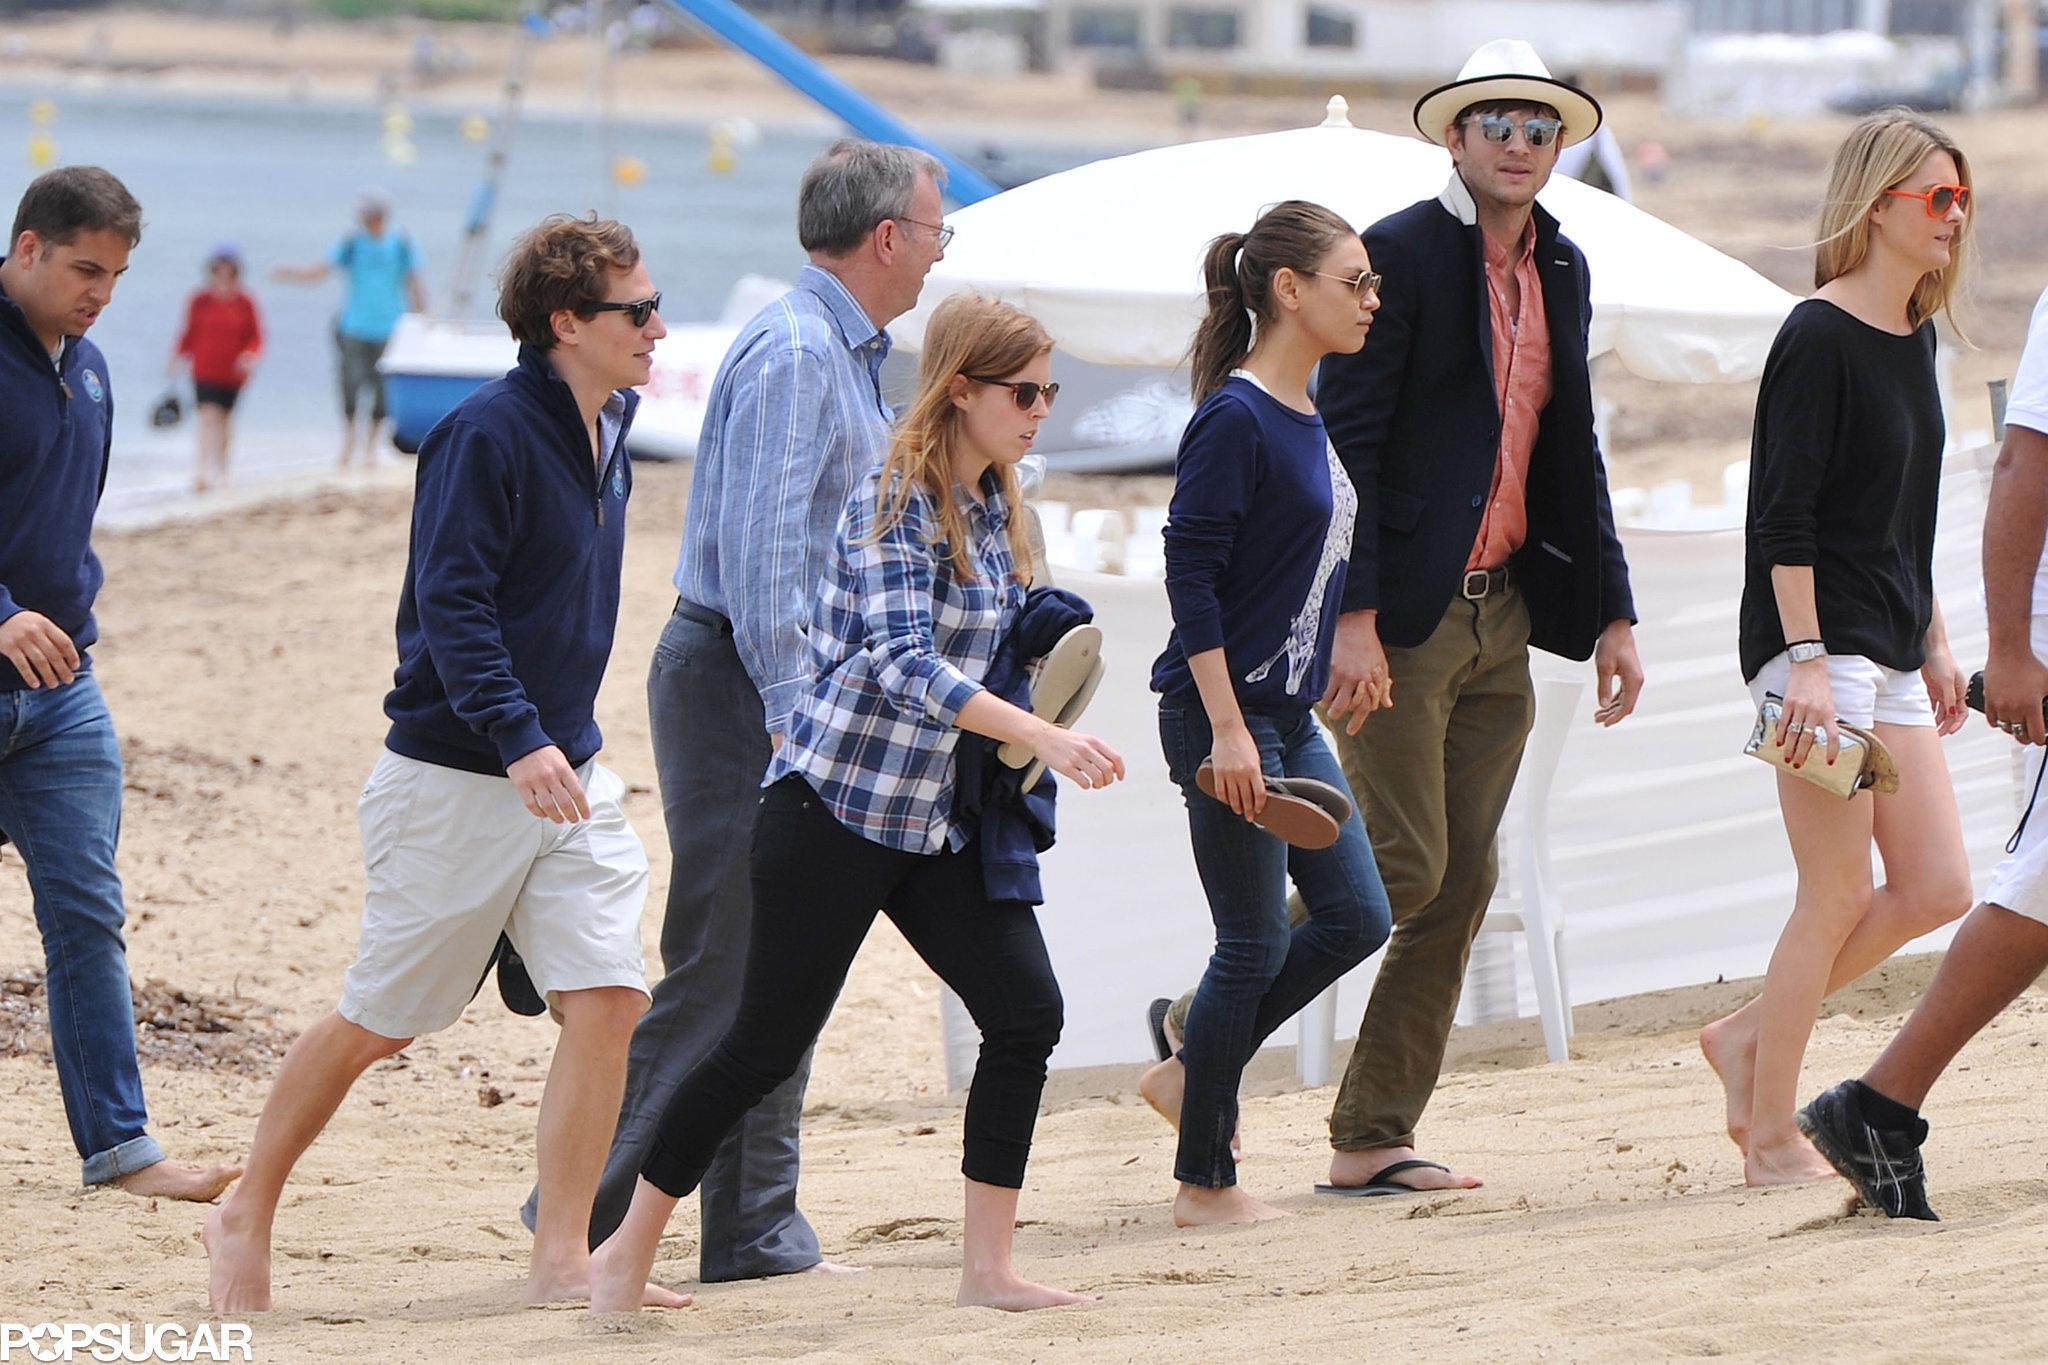 Ashton Kutcher and Princess Beatrice